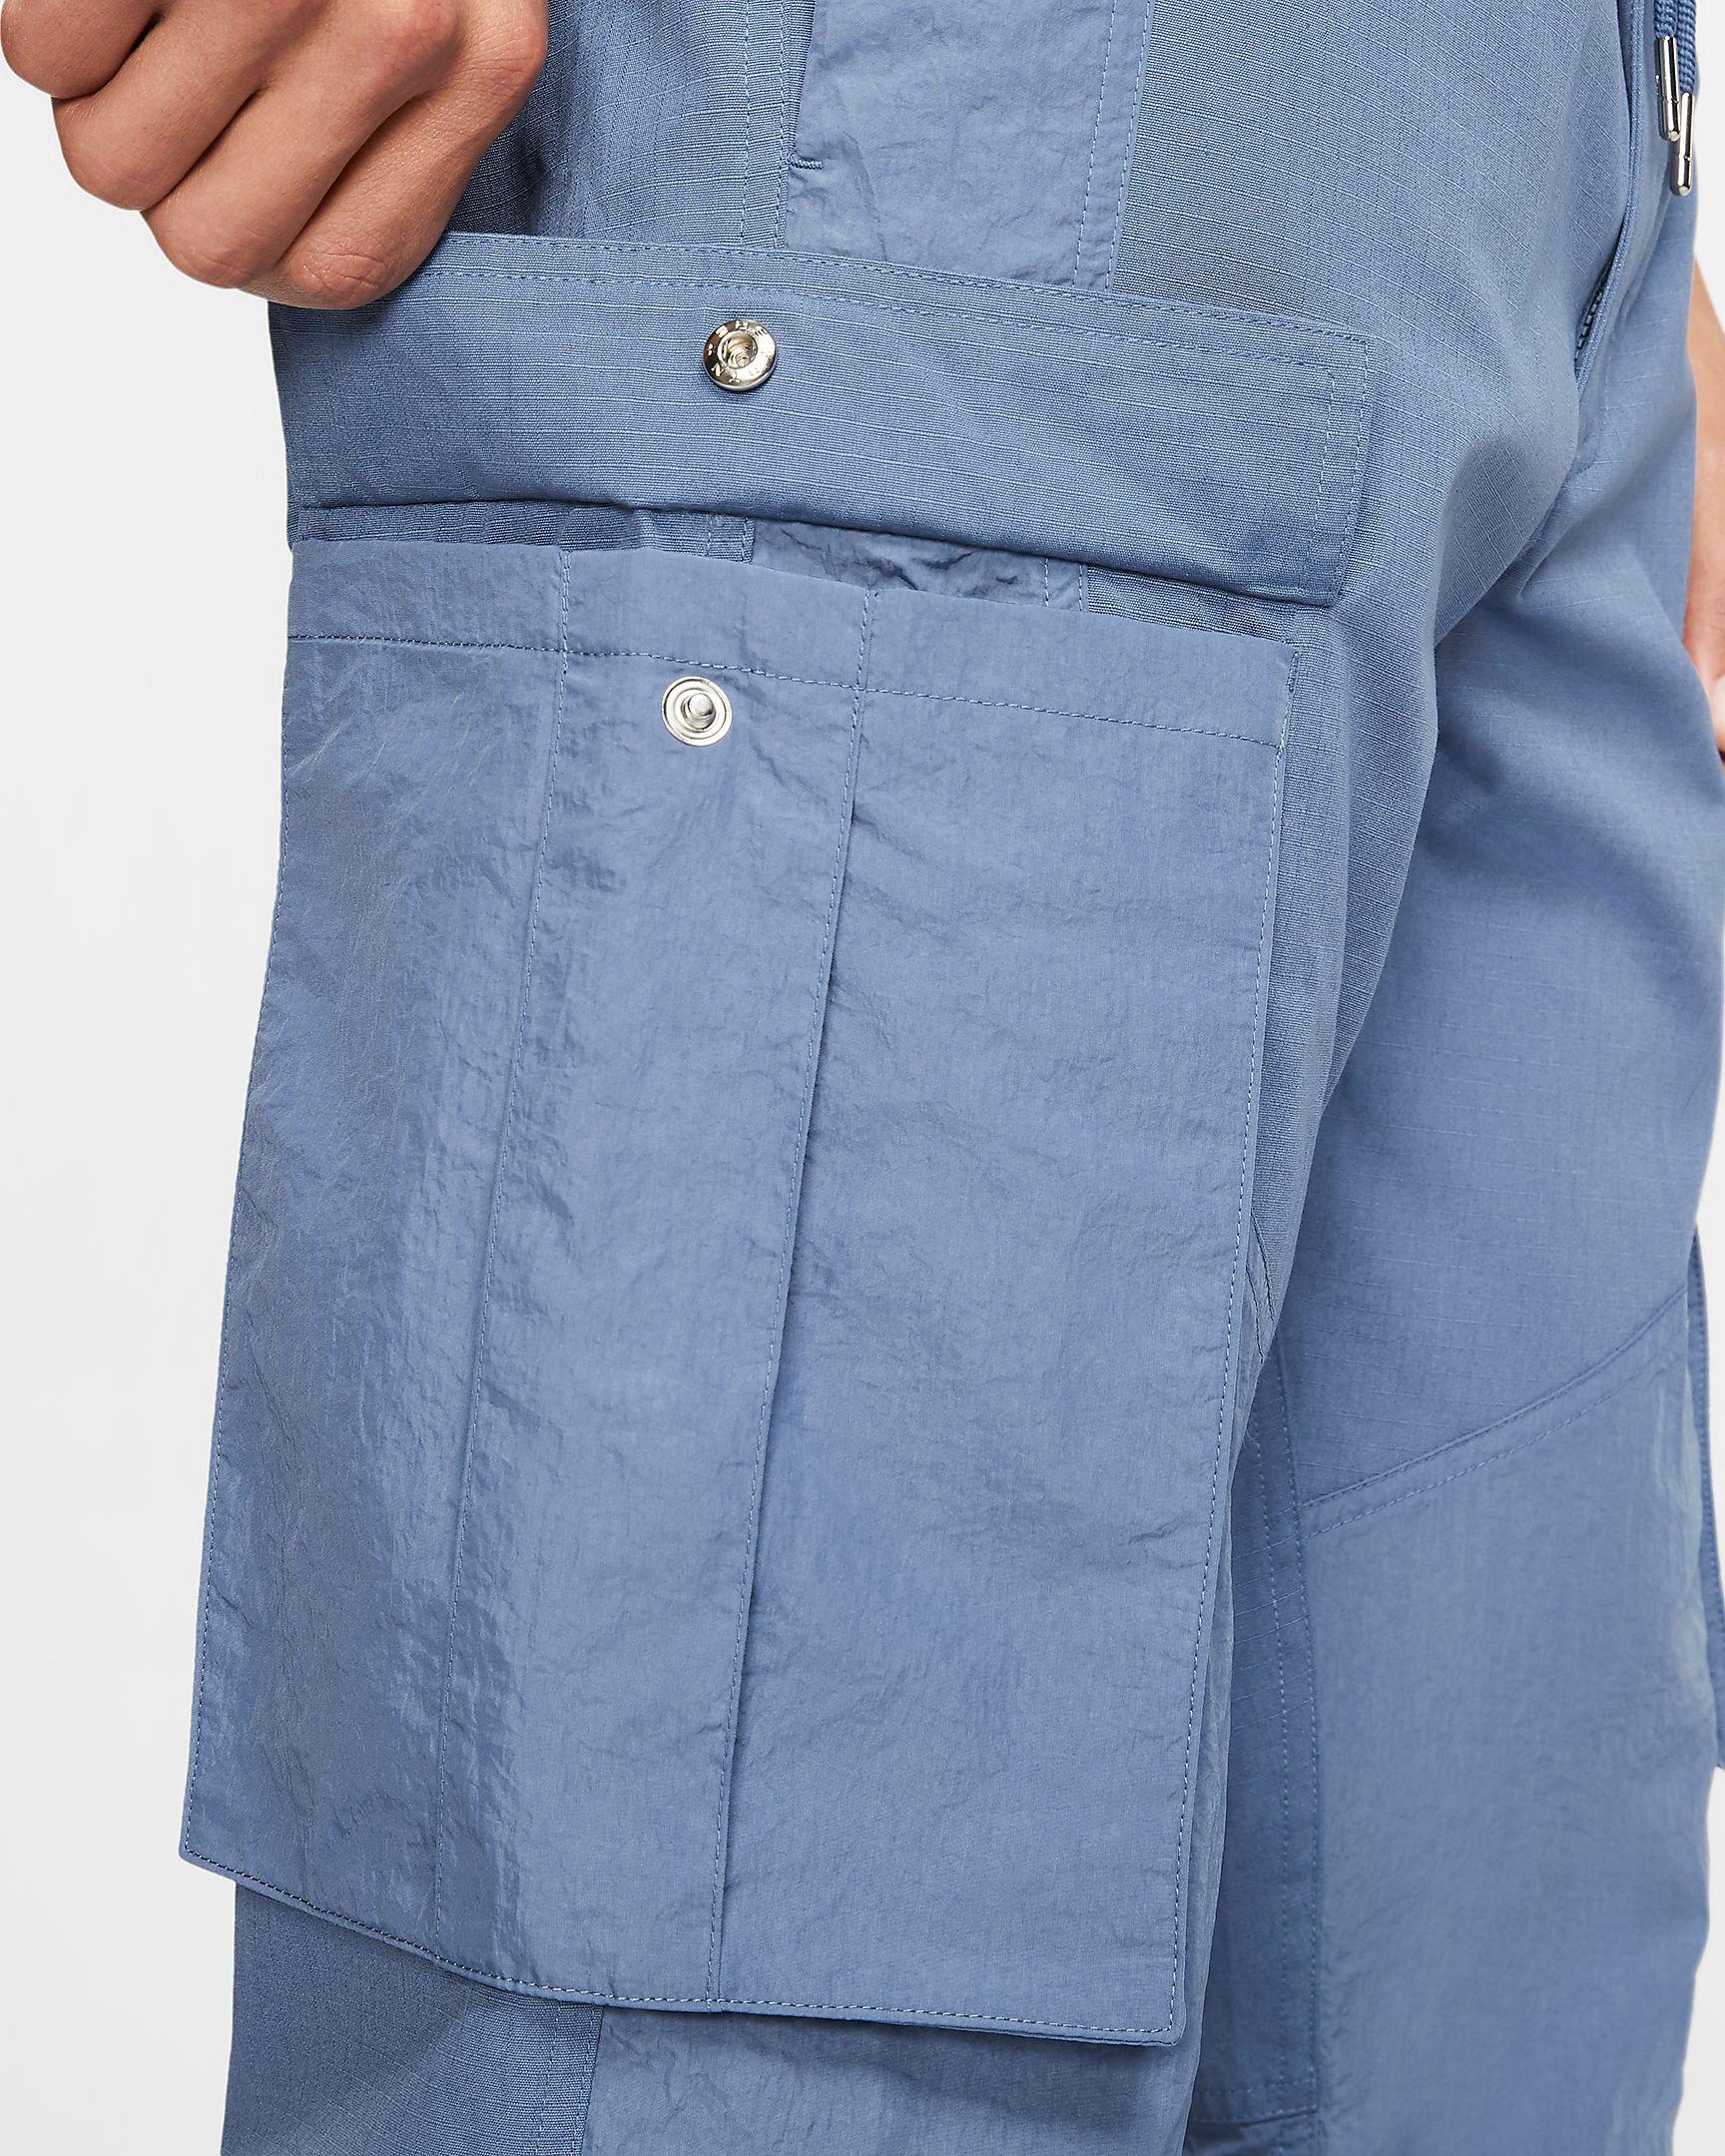 jordan-sport-dna-cargo-pants-navy-blue-5